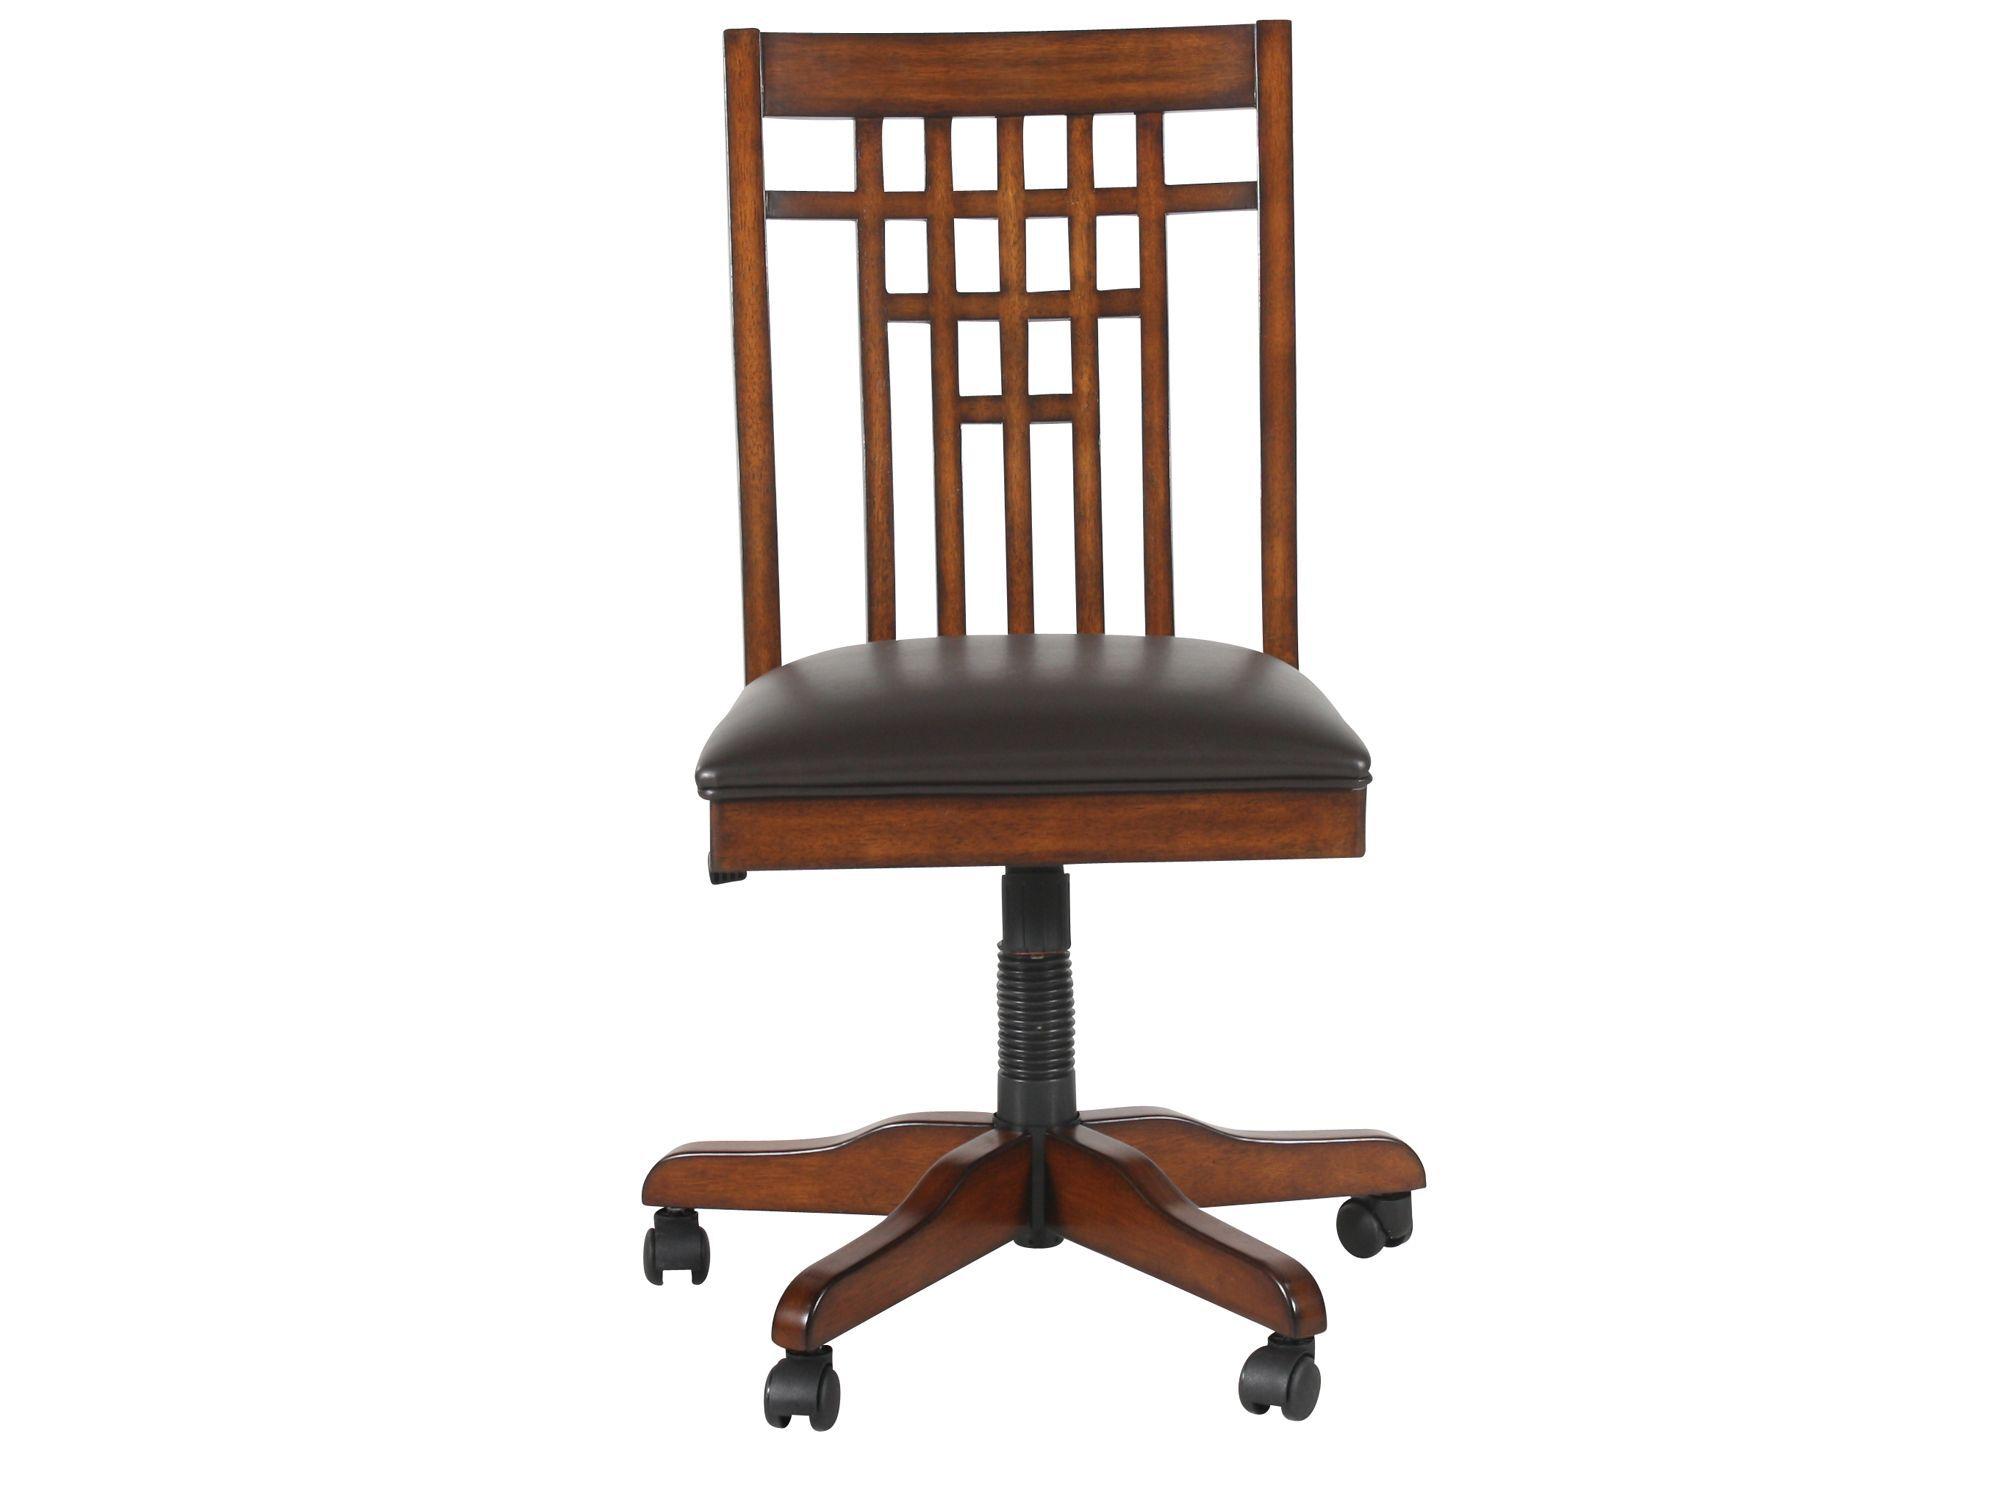 zahara swivel chair captains gym machine spladder back tilt office in medium oak | mathis brothers furniture